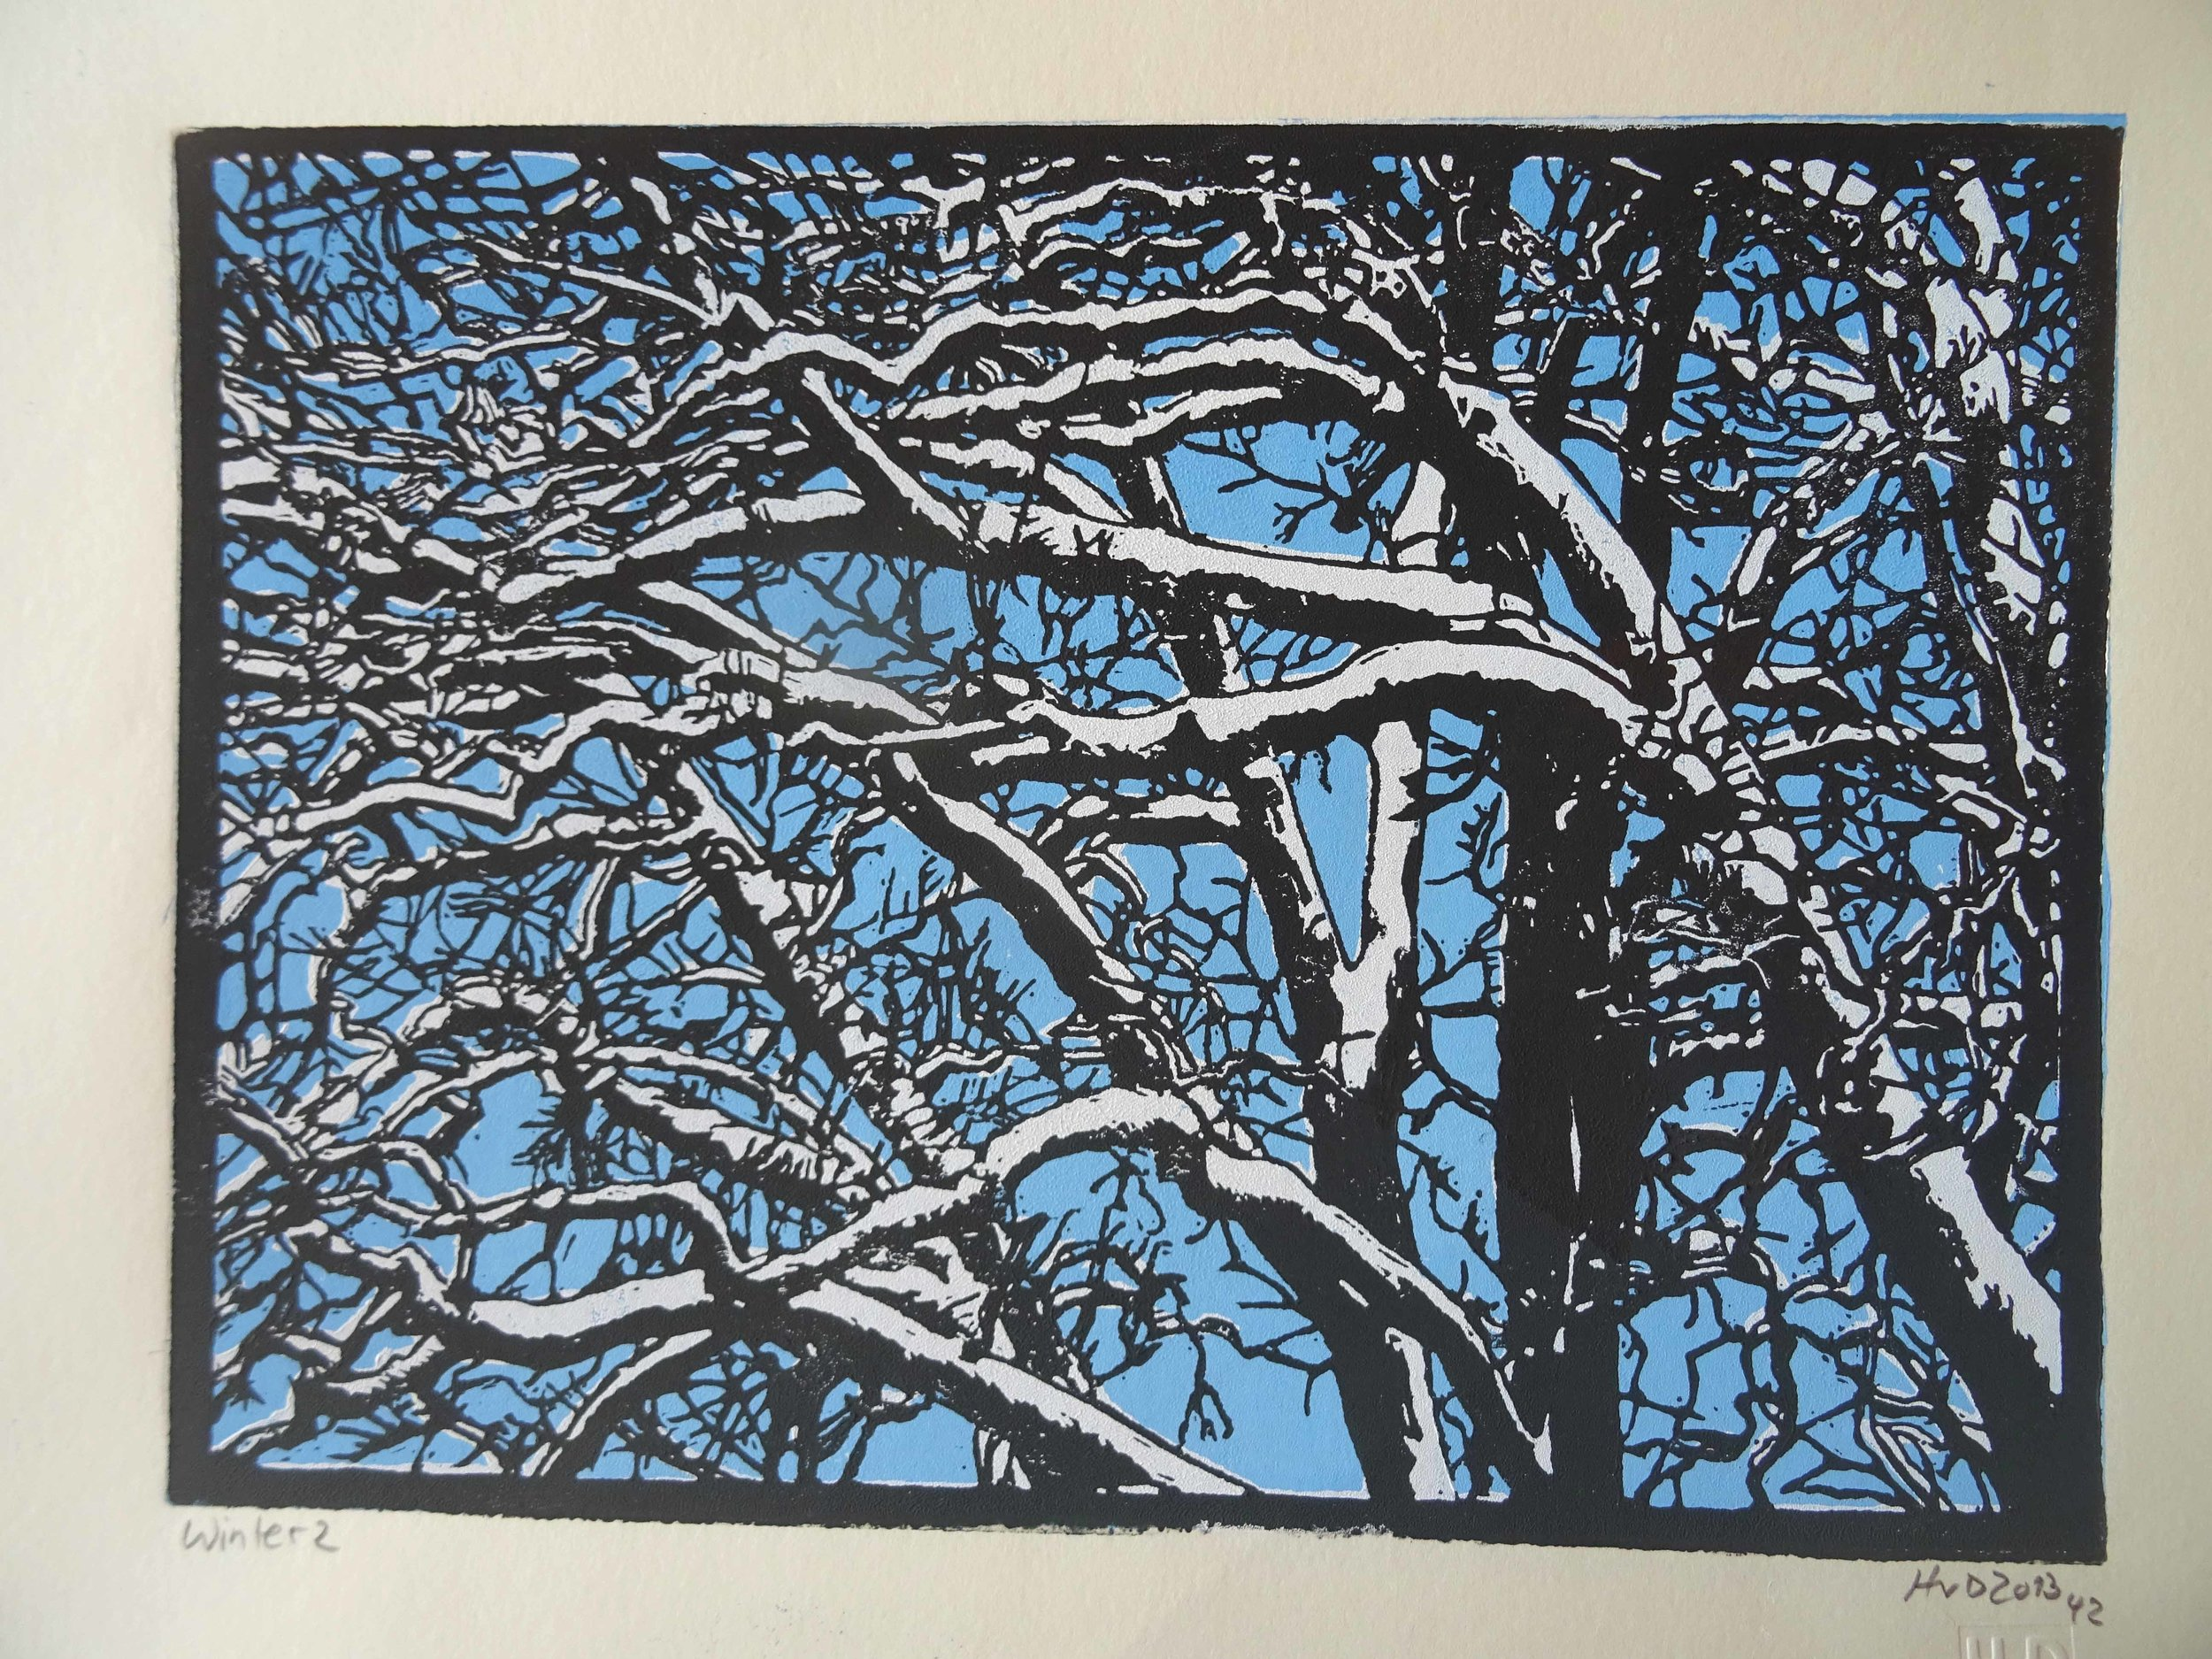 135-1, winter trees, 21x30 cm, 3-plate lino, 80 €